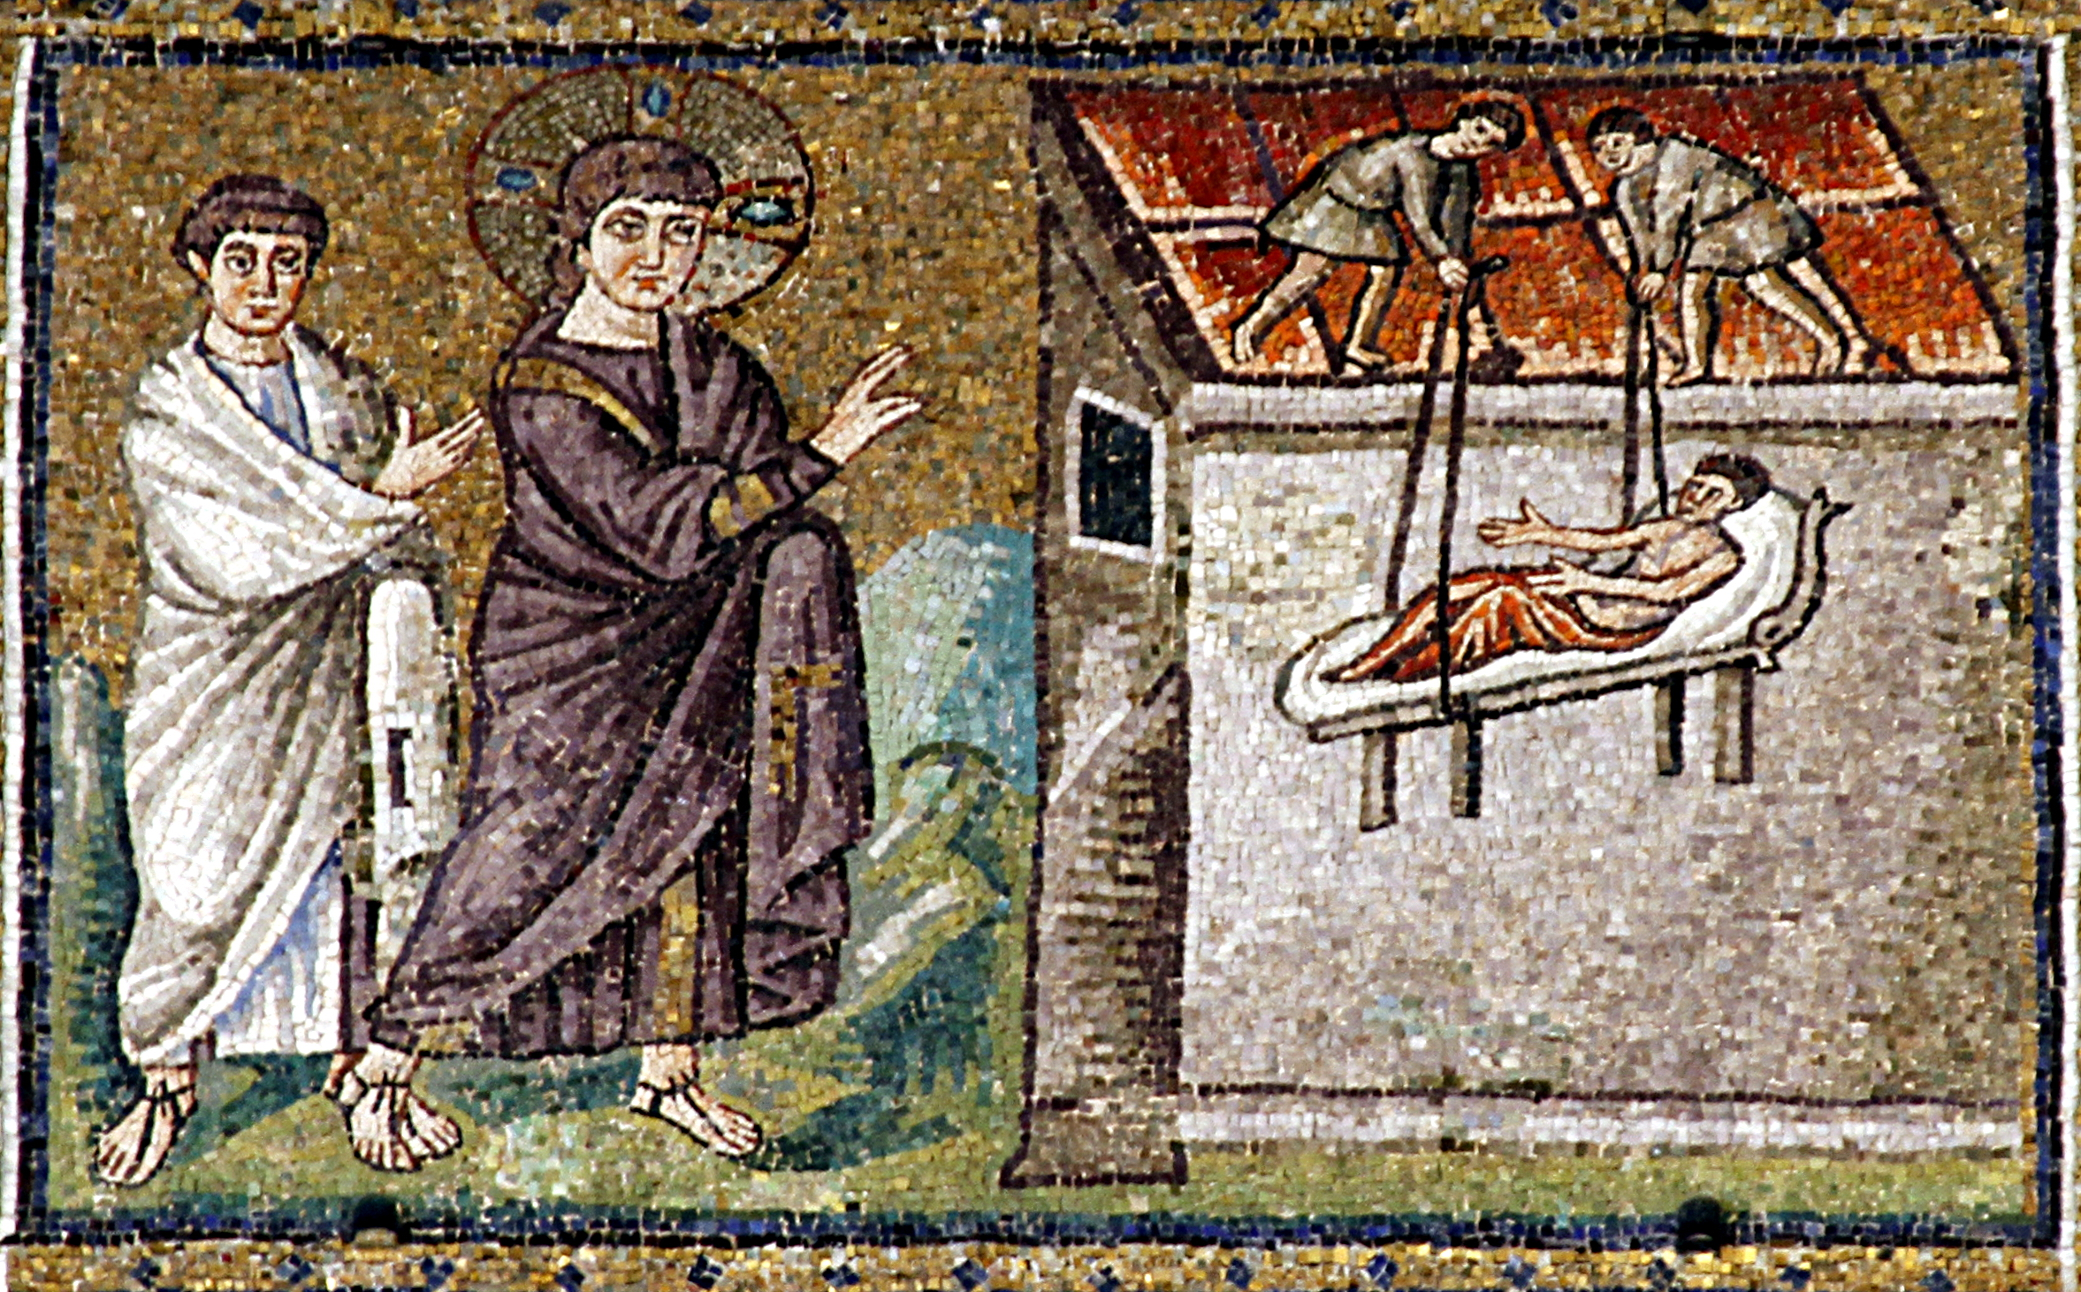 FileJesus Healing The Paralytic In Cafarnaum